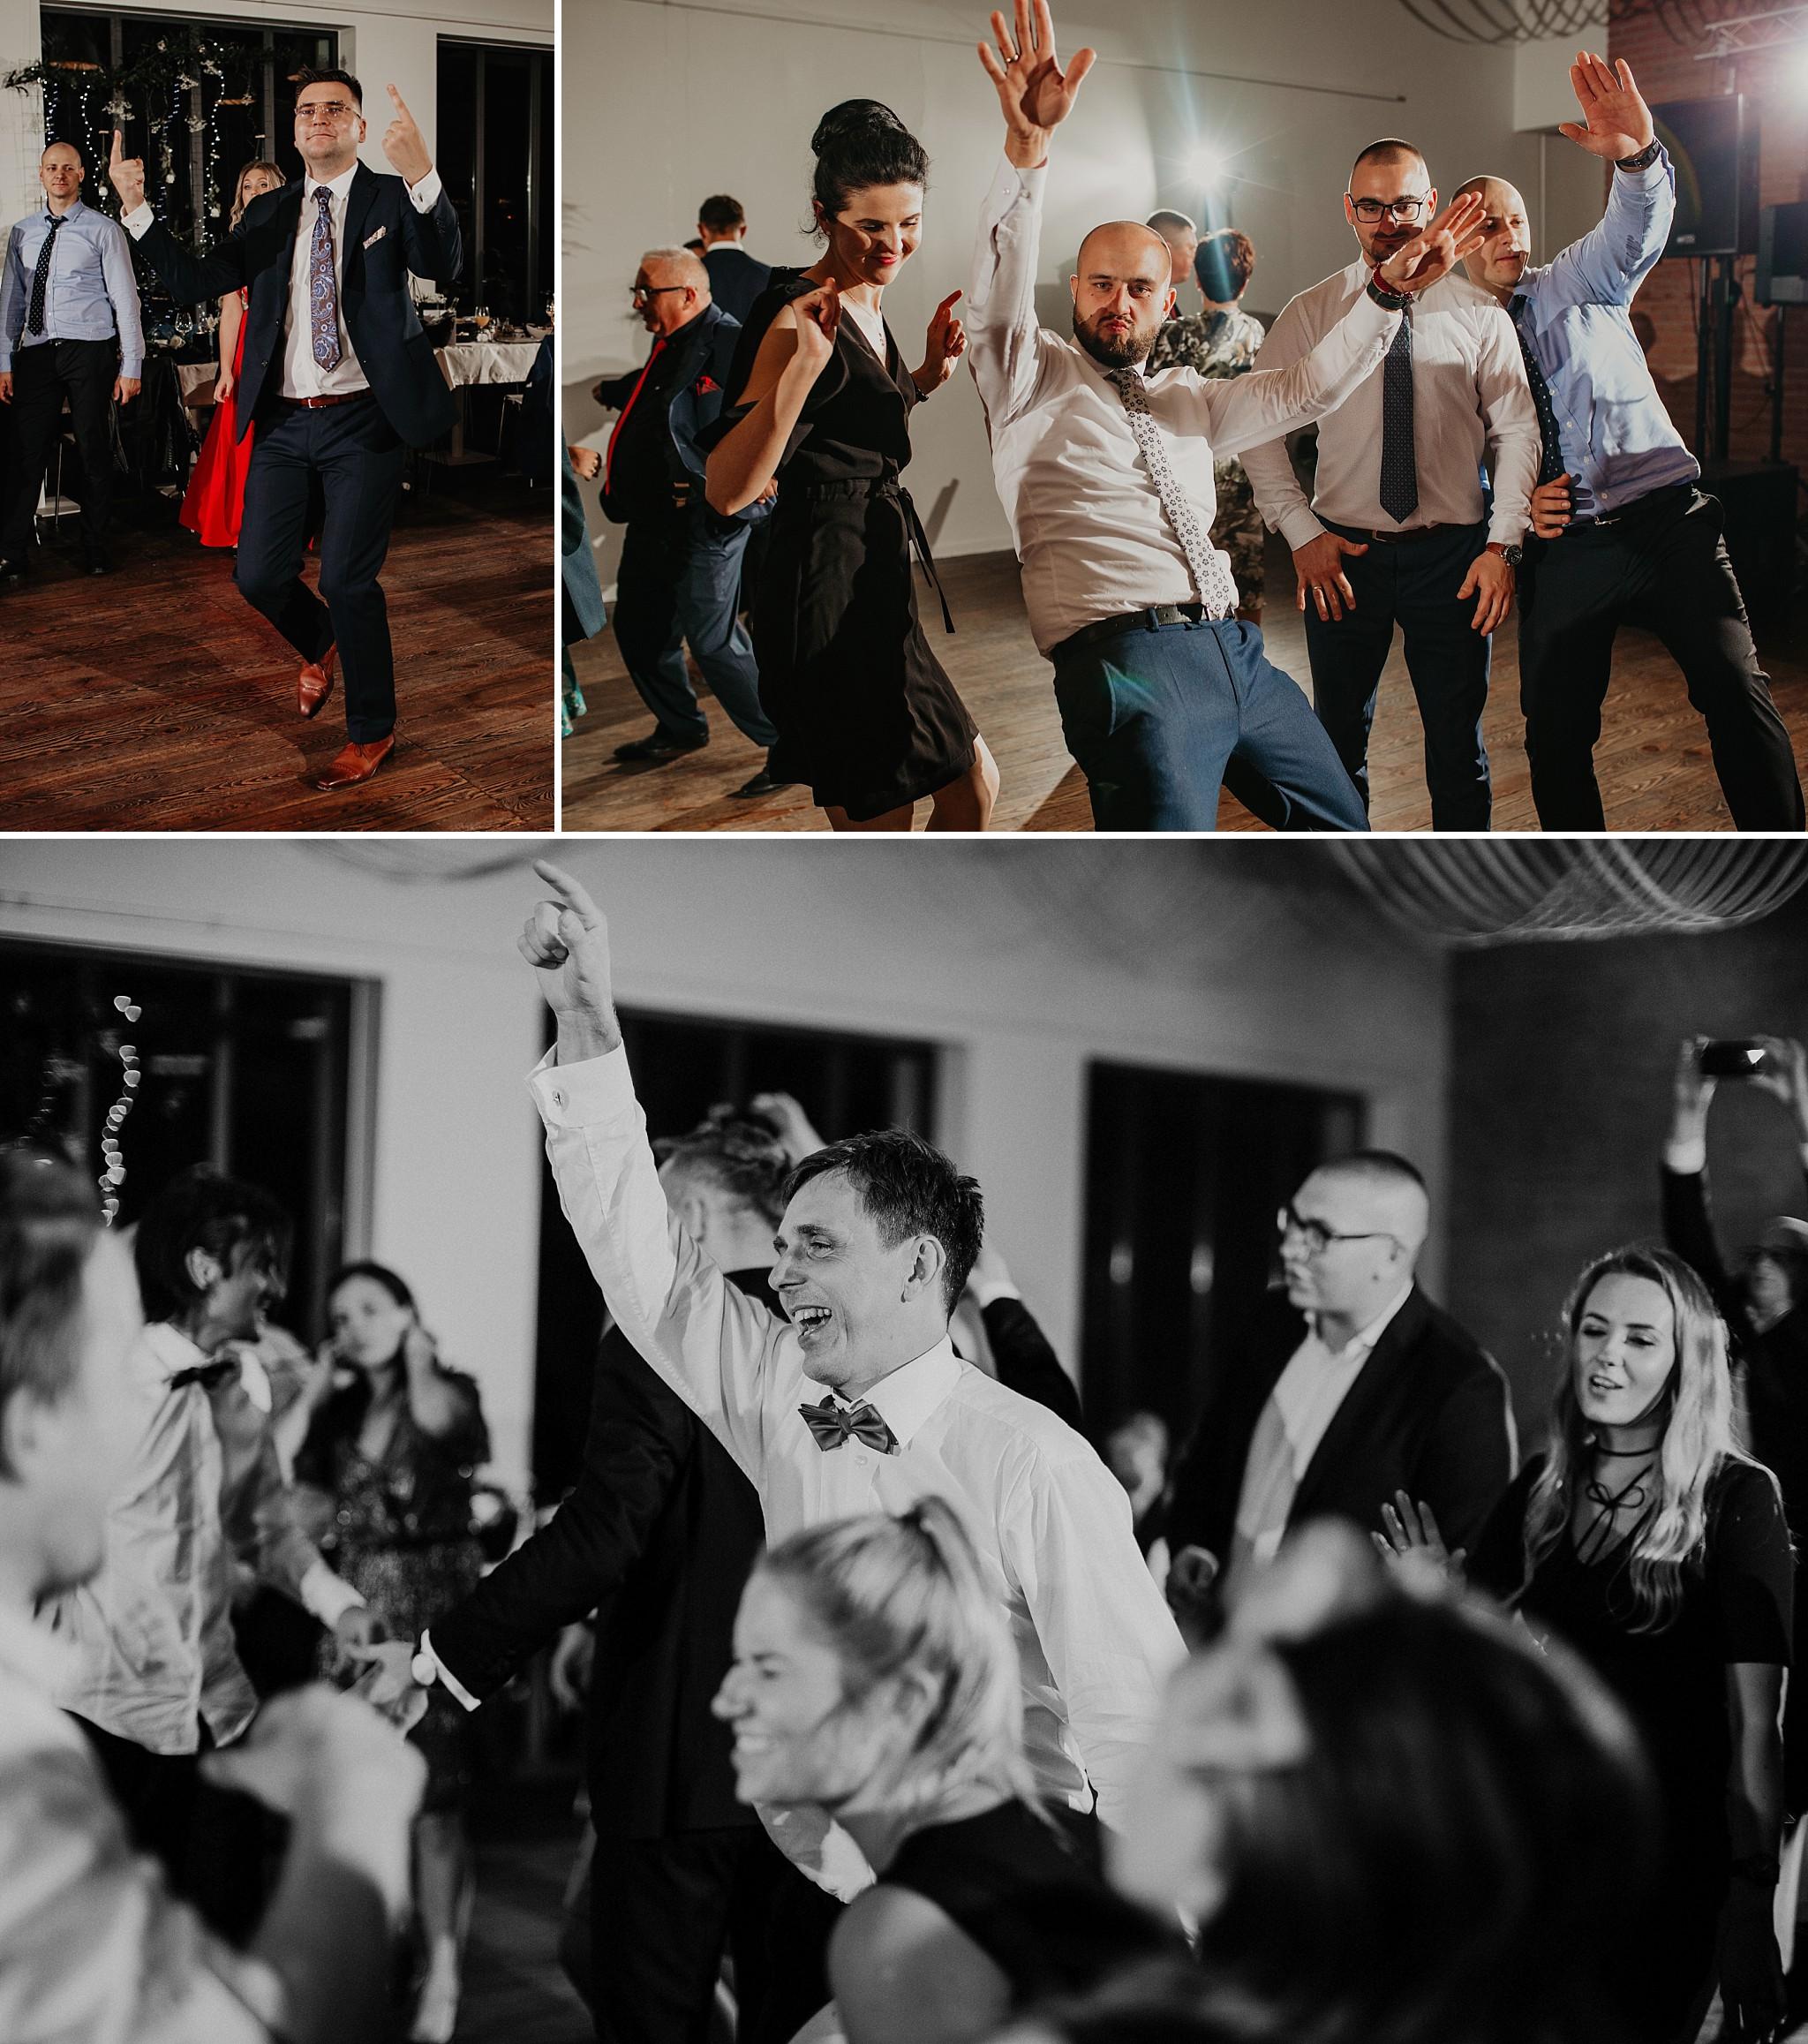 fotograf poznan wesele dobra truskawka piekne wesele pod poznaniem wesele w dobrej truskawce piekna para mloda slub marzen slub koronawirus slub listopad wesele koronawirus 476